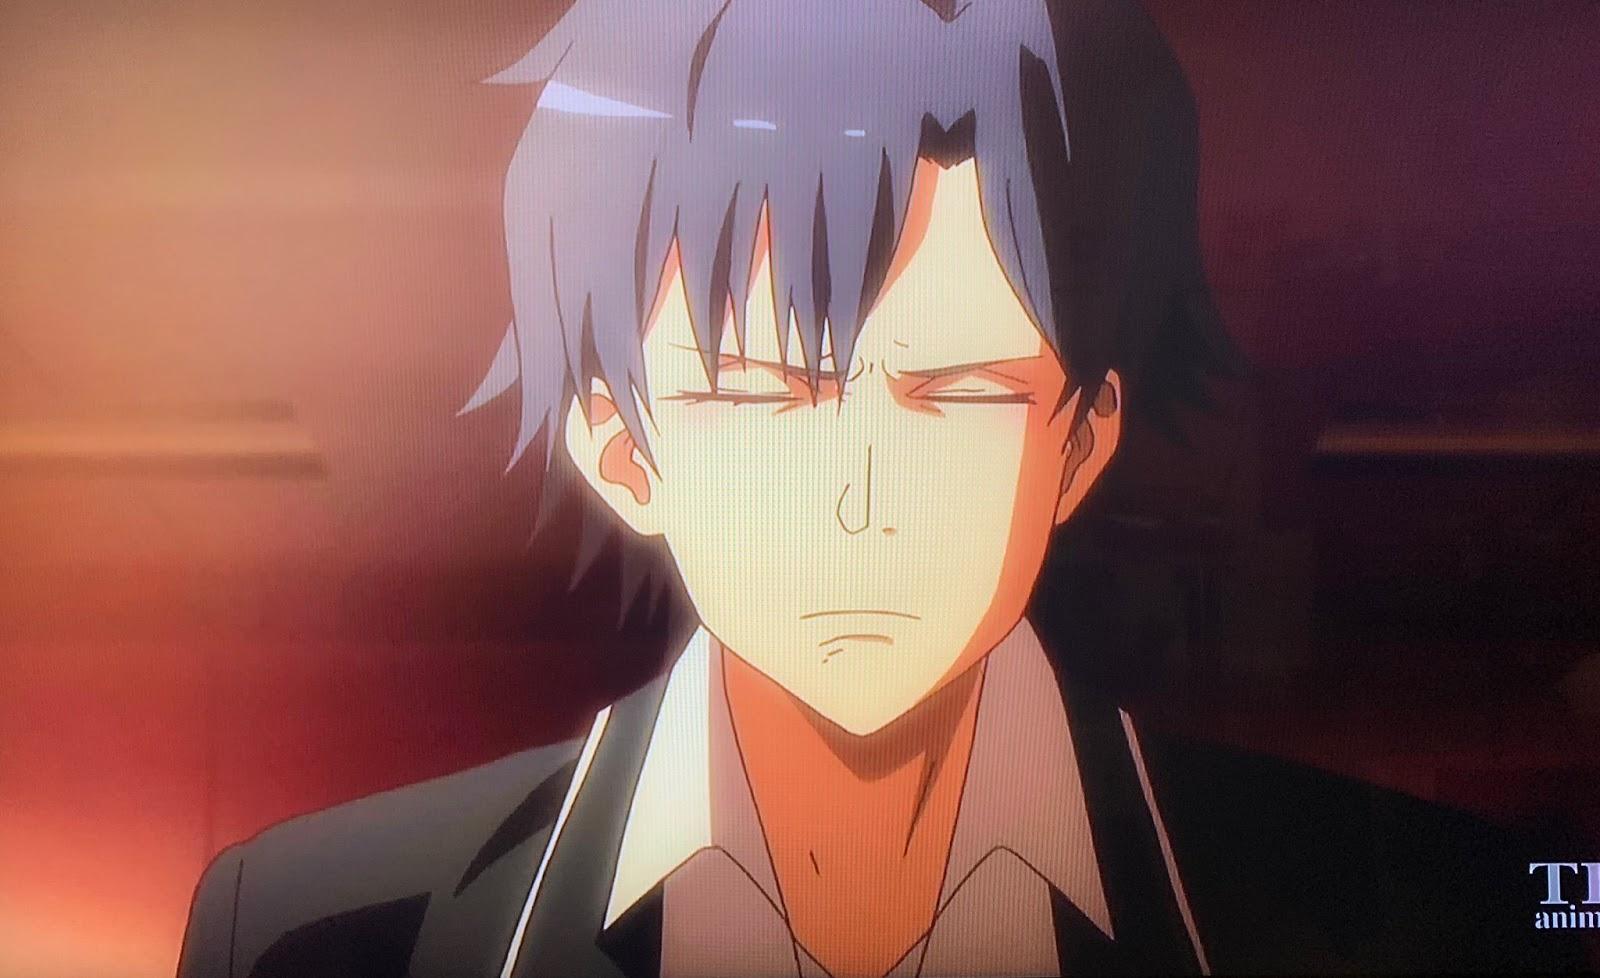 Oregairu Season 3 - Episode 2